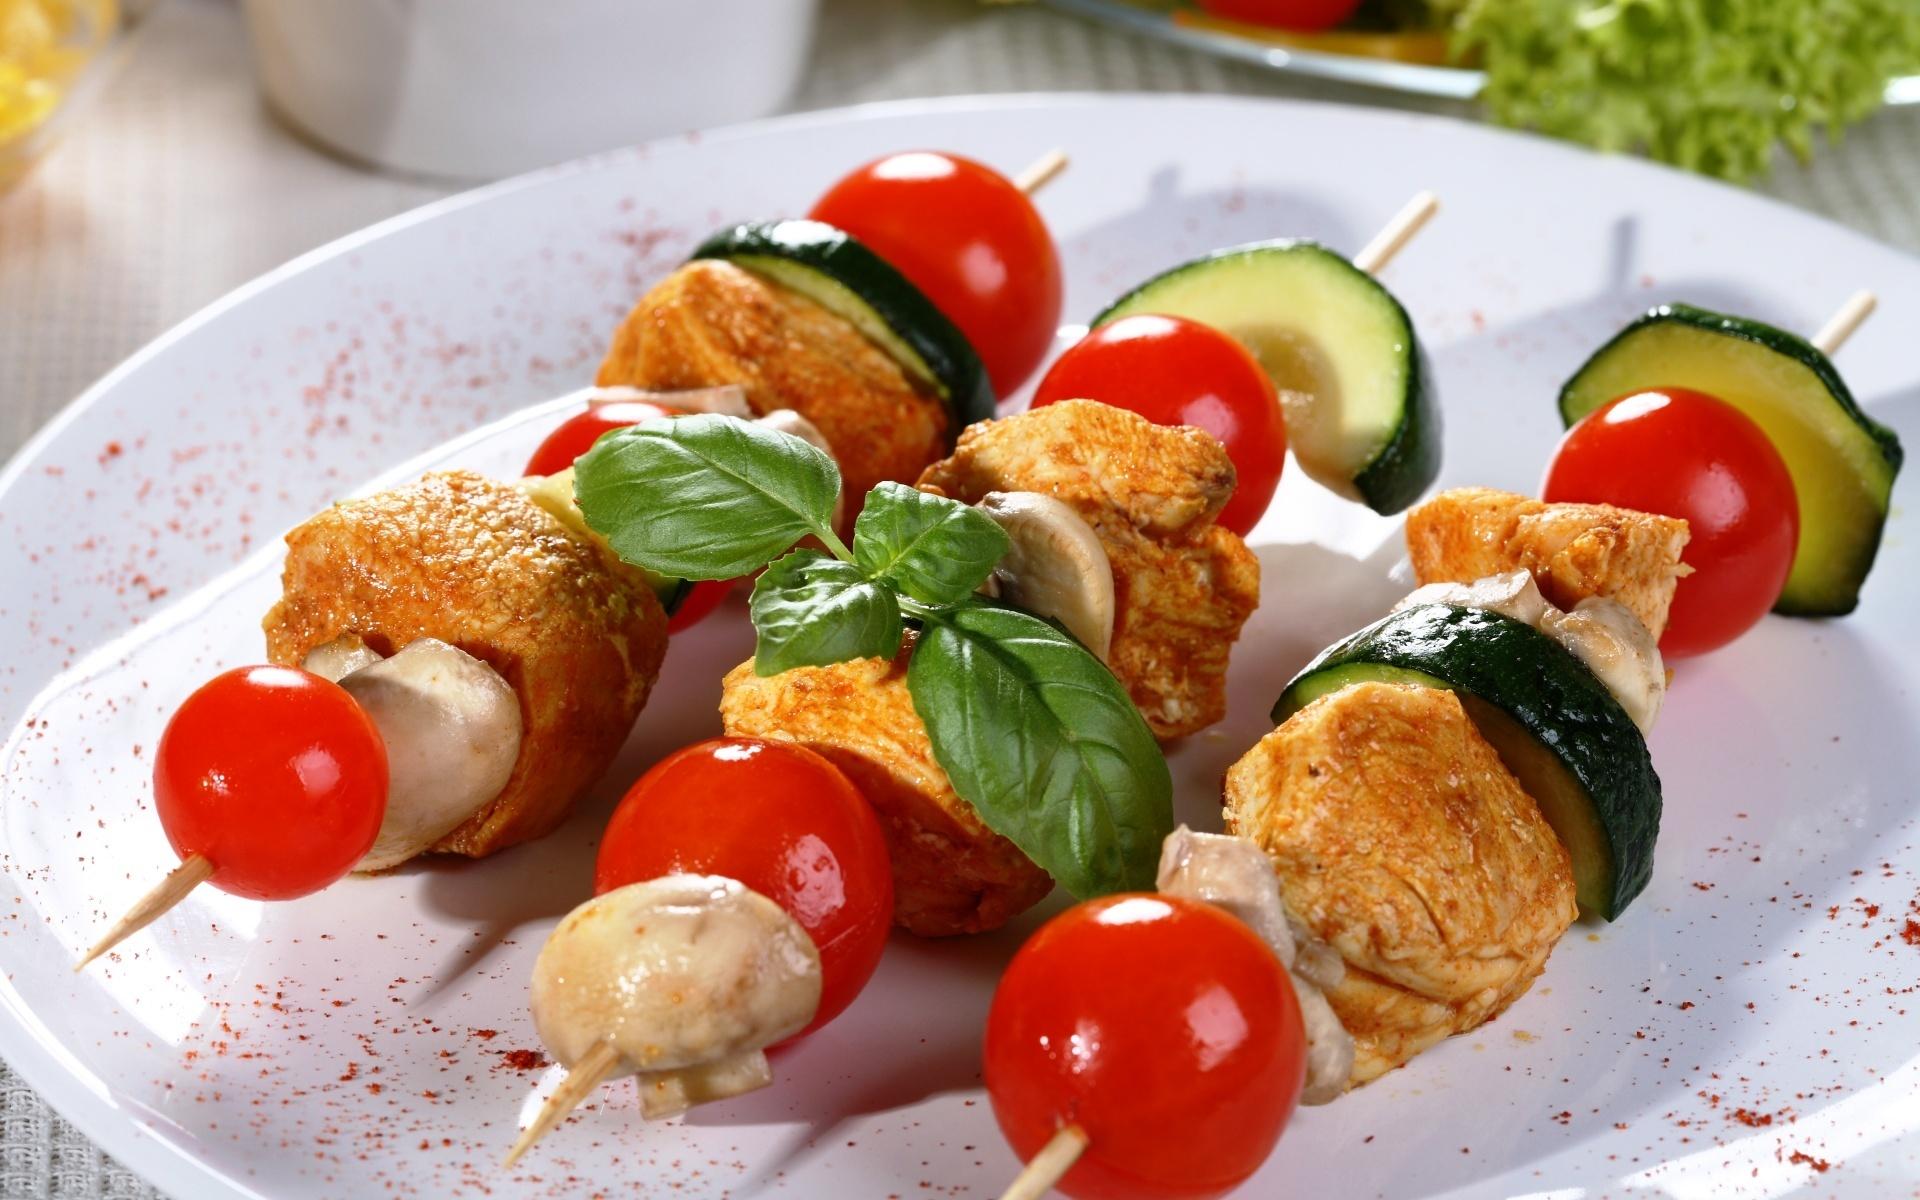 comida_83_20120802_1304755659